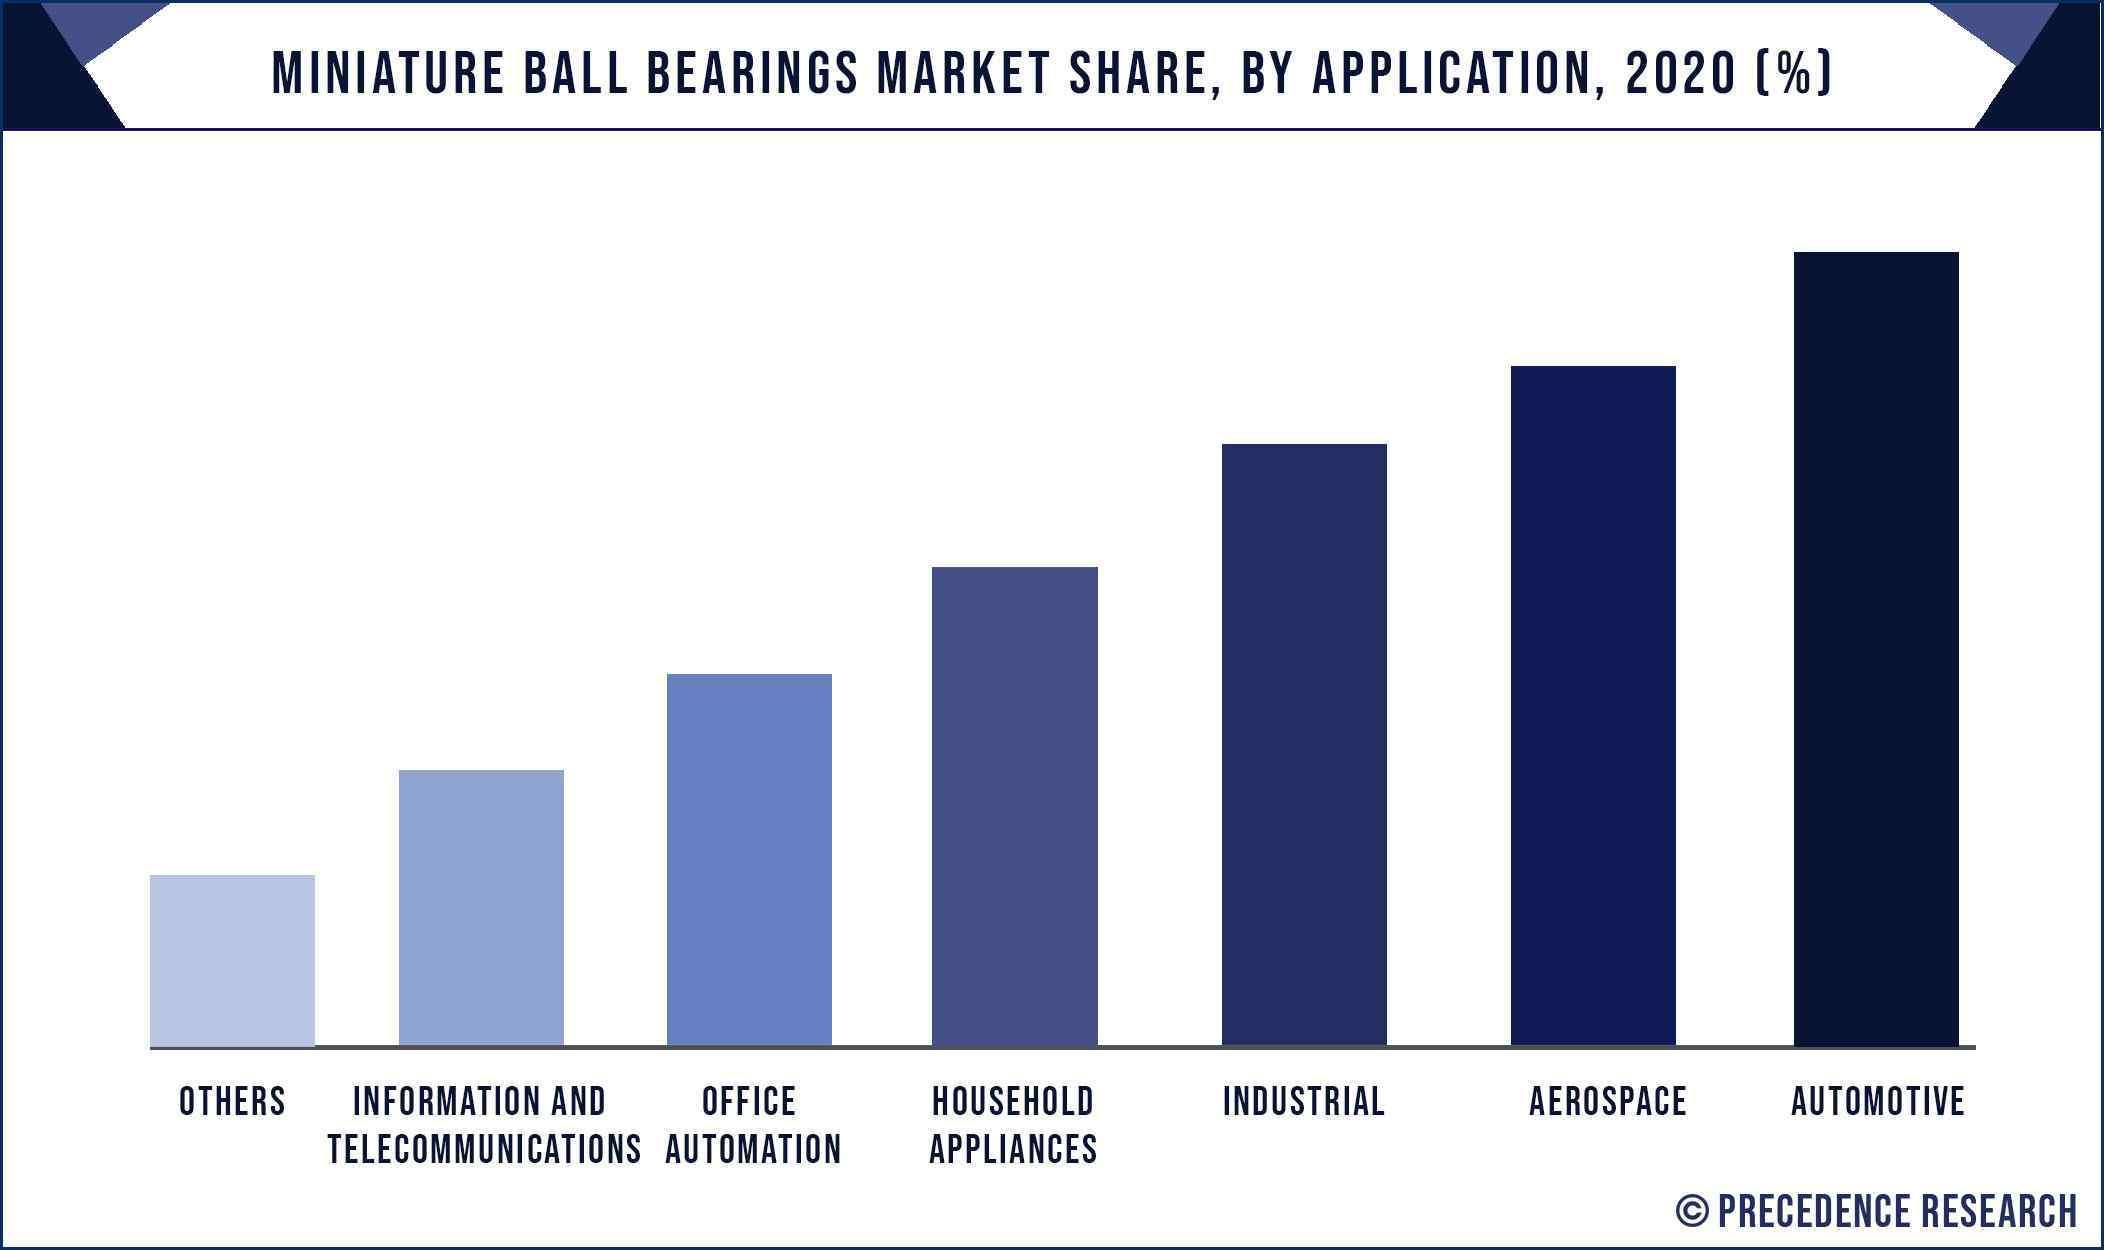 Miniature Ball Bearings Market Share, By Application, 2020 (%)